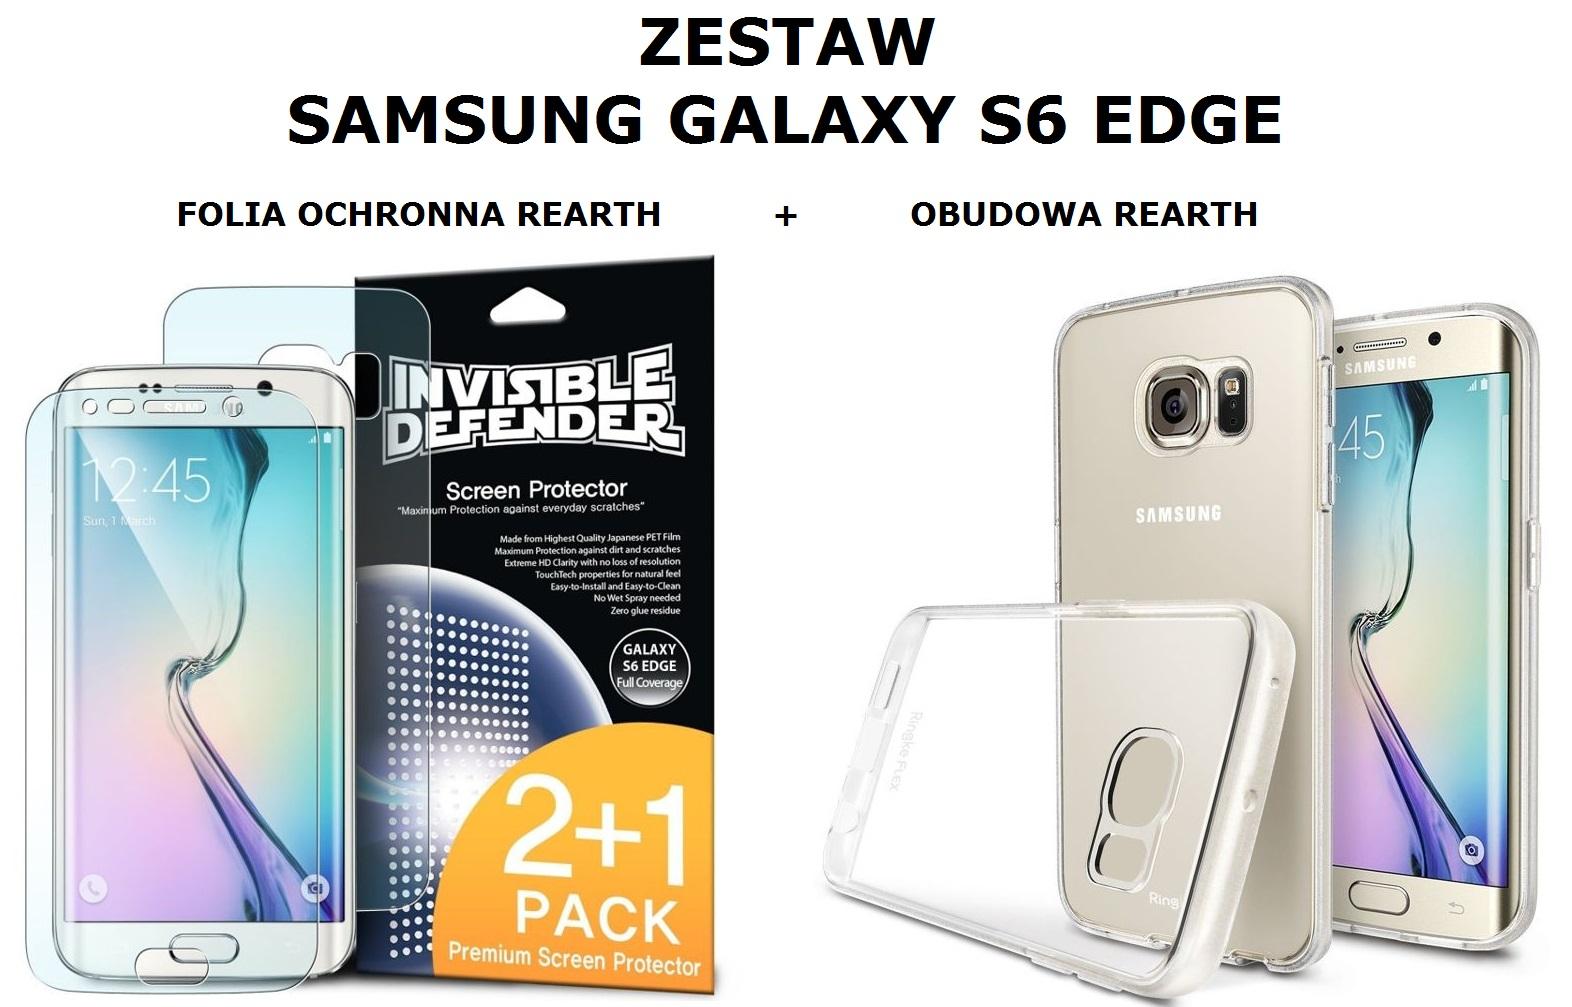 Zestaw Rearth Obudowa Ringke Flex 3 Folie Ochronne Galaxy S8 Invisible Defender Screen Protector Rewelacyjny